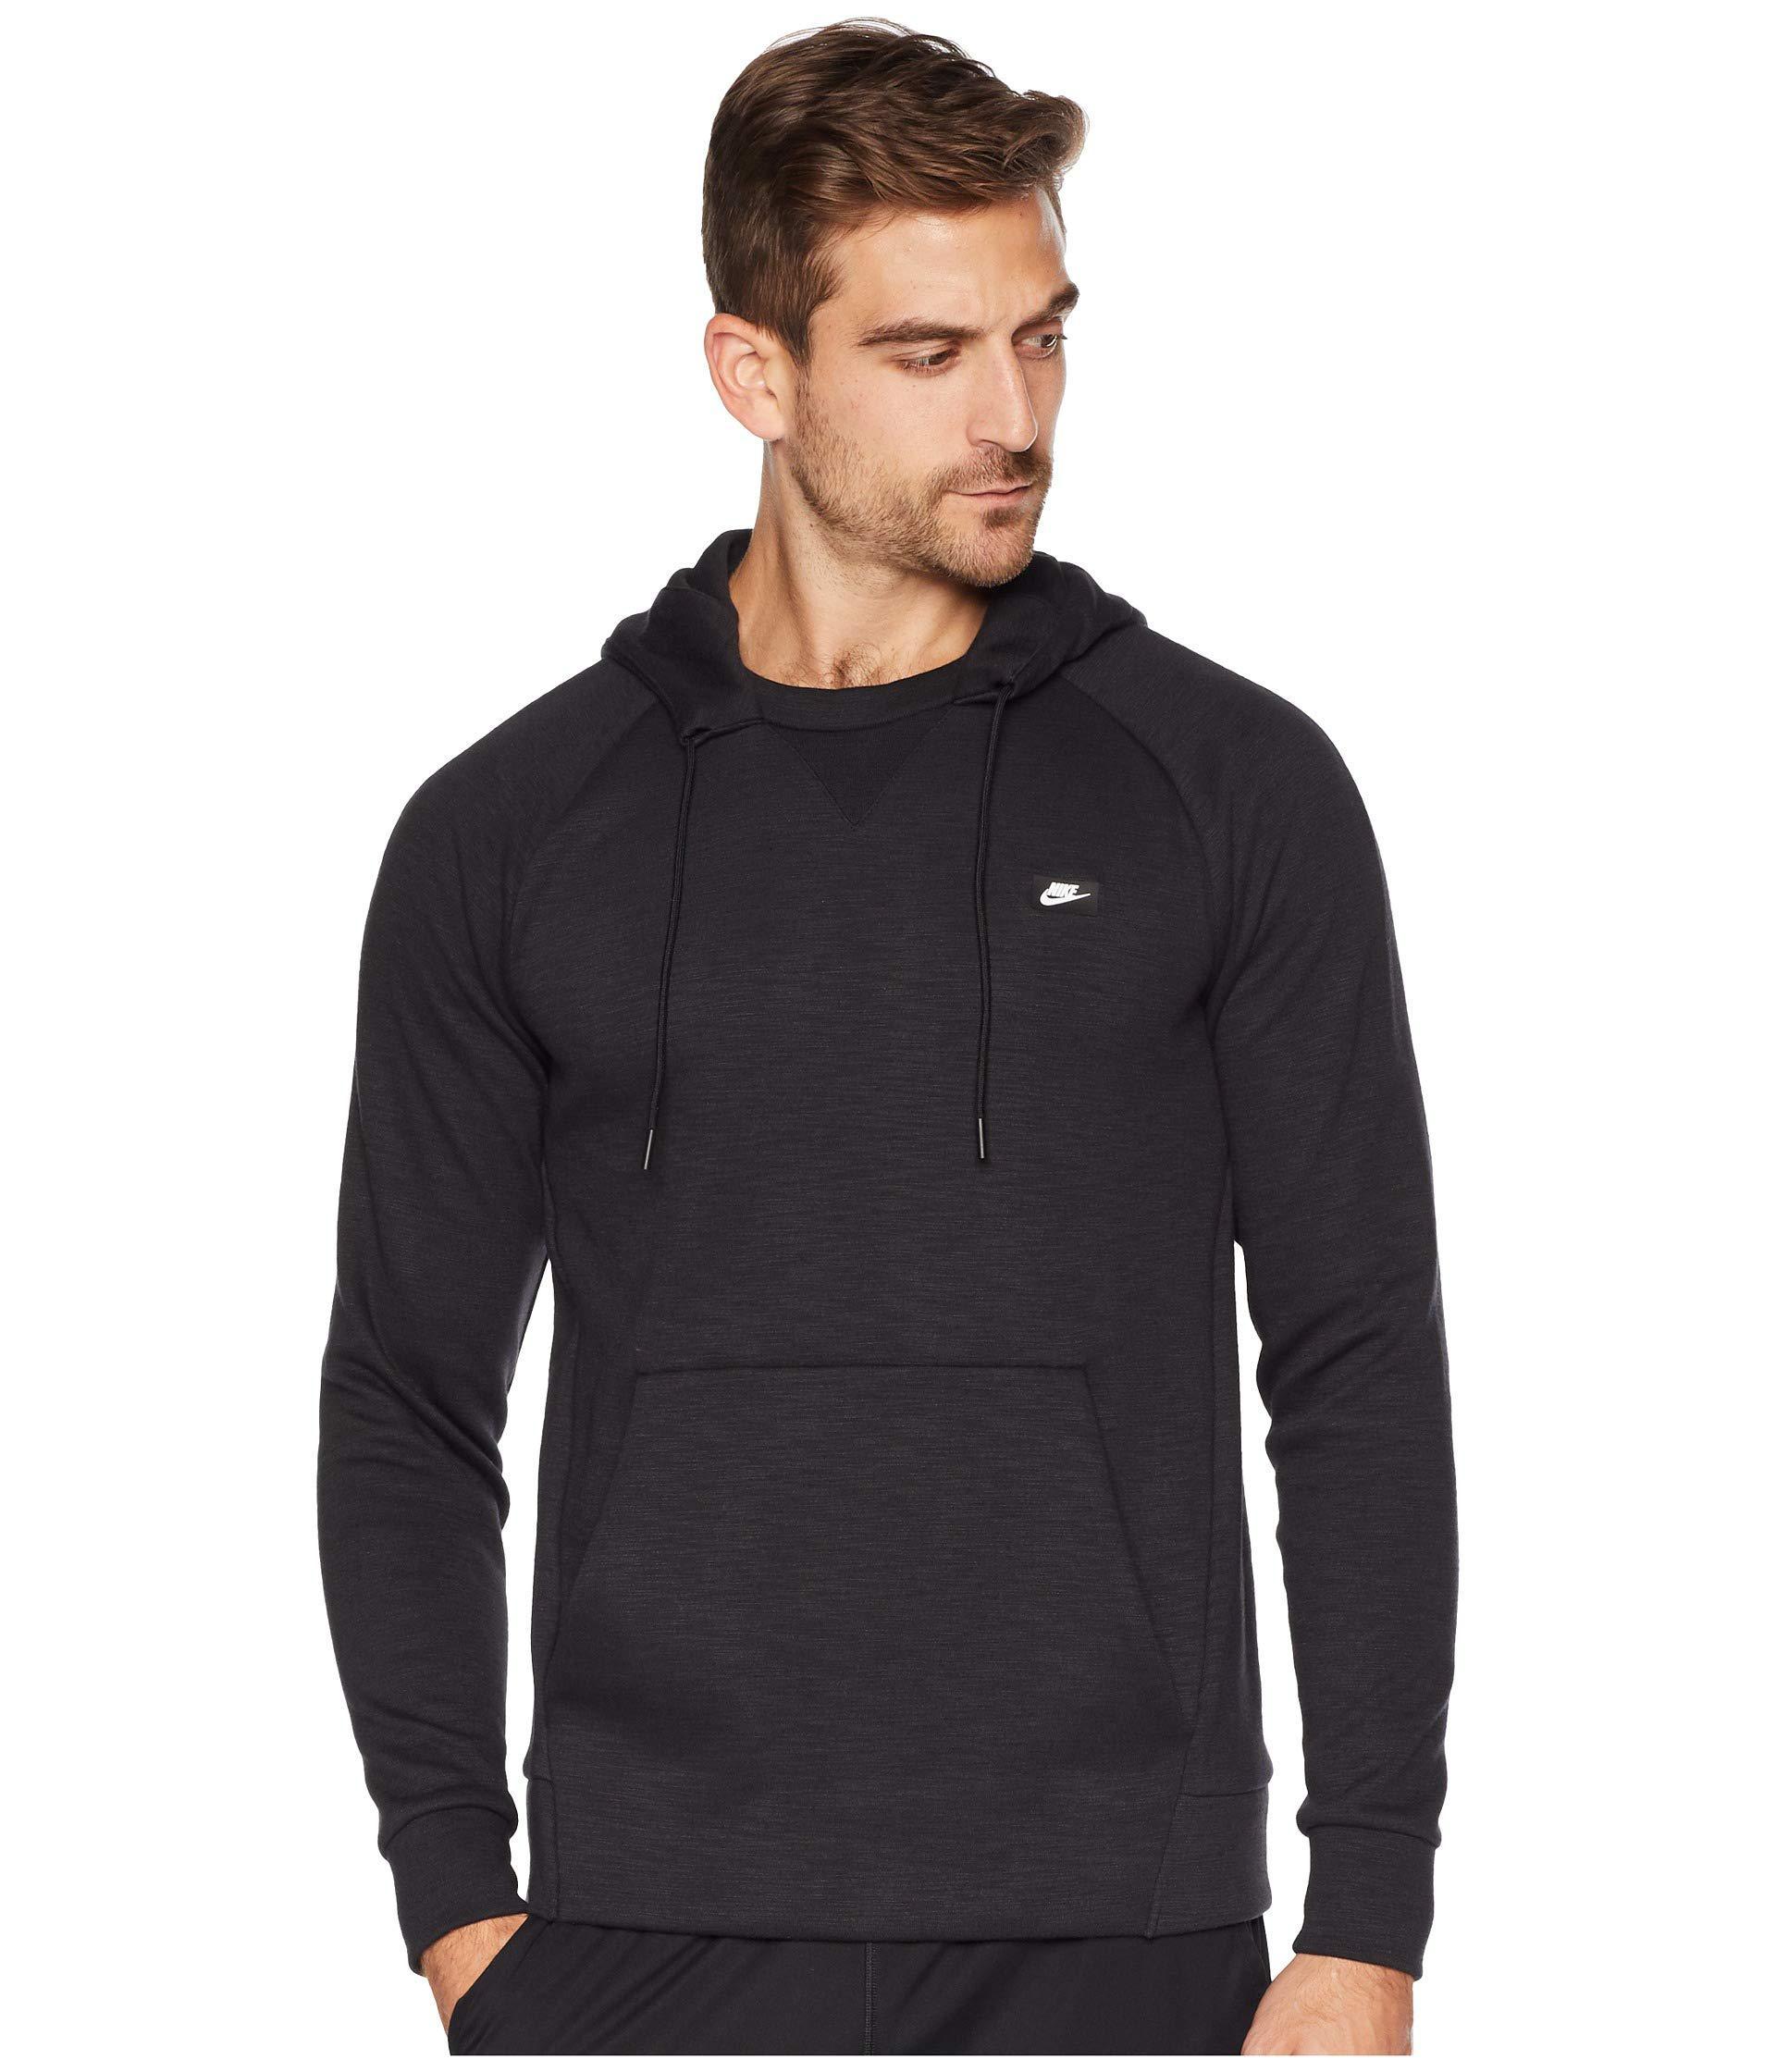 oben Nike Optic Hoodie Mens zu verkaufen 5W6V79xu online